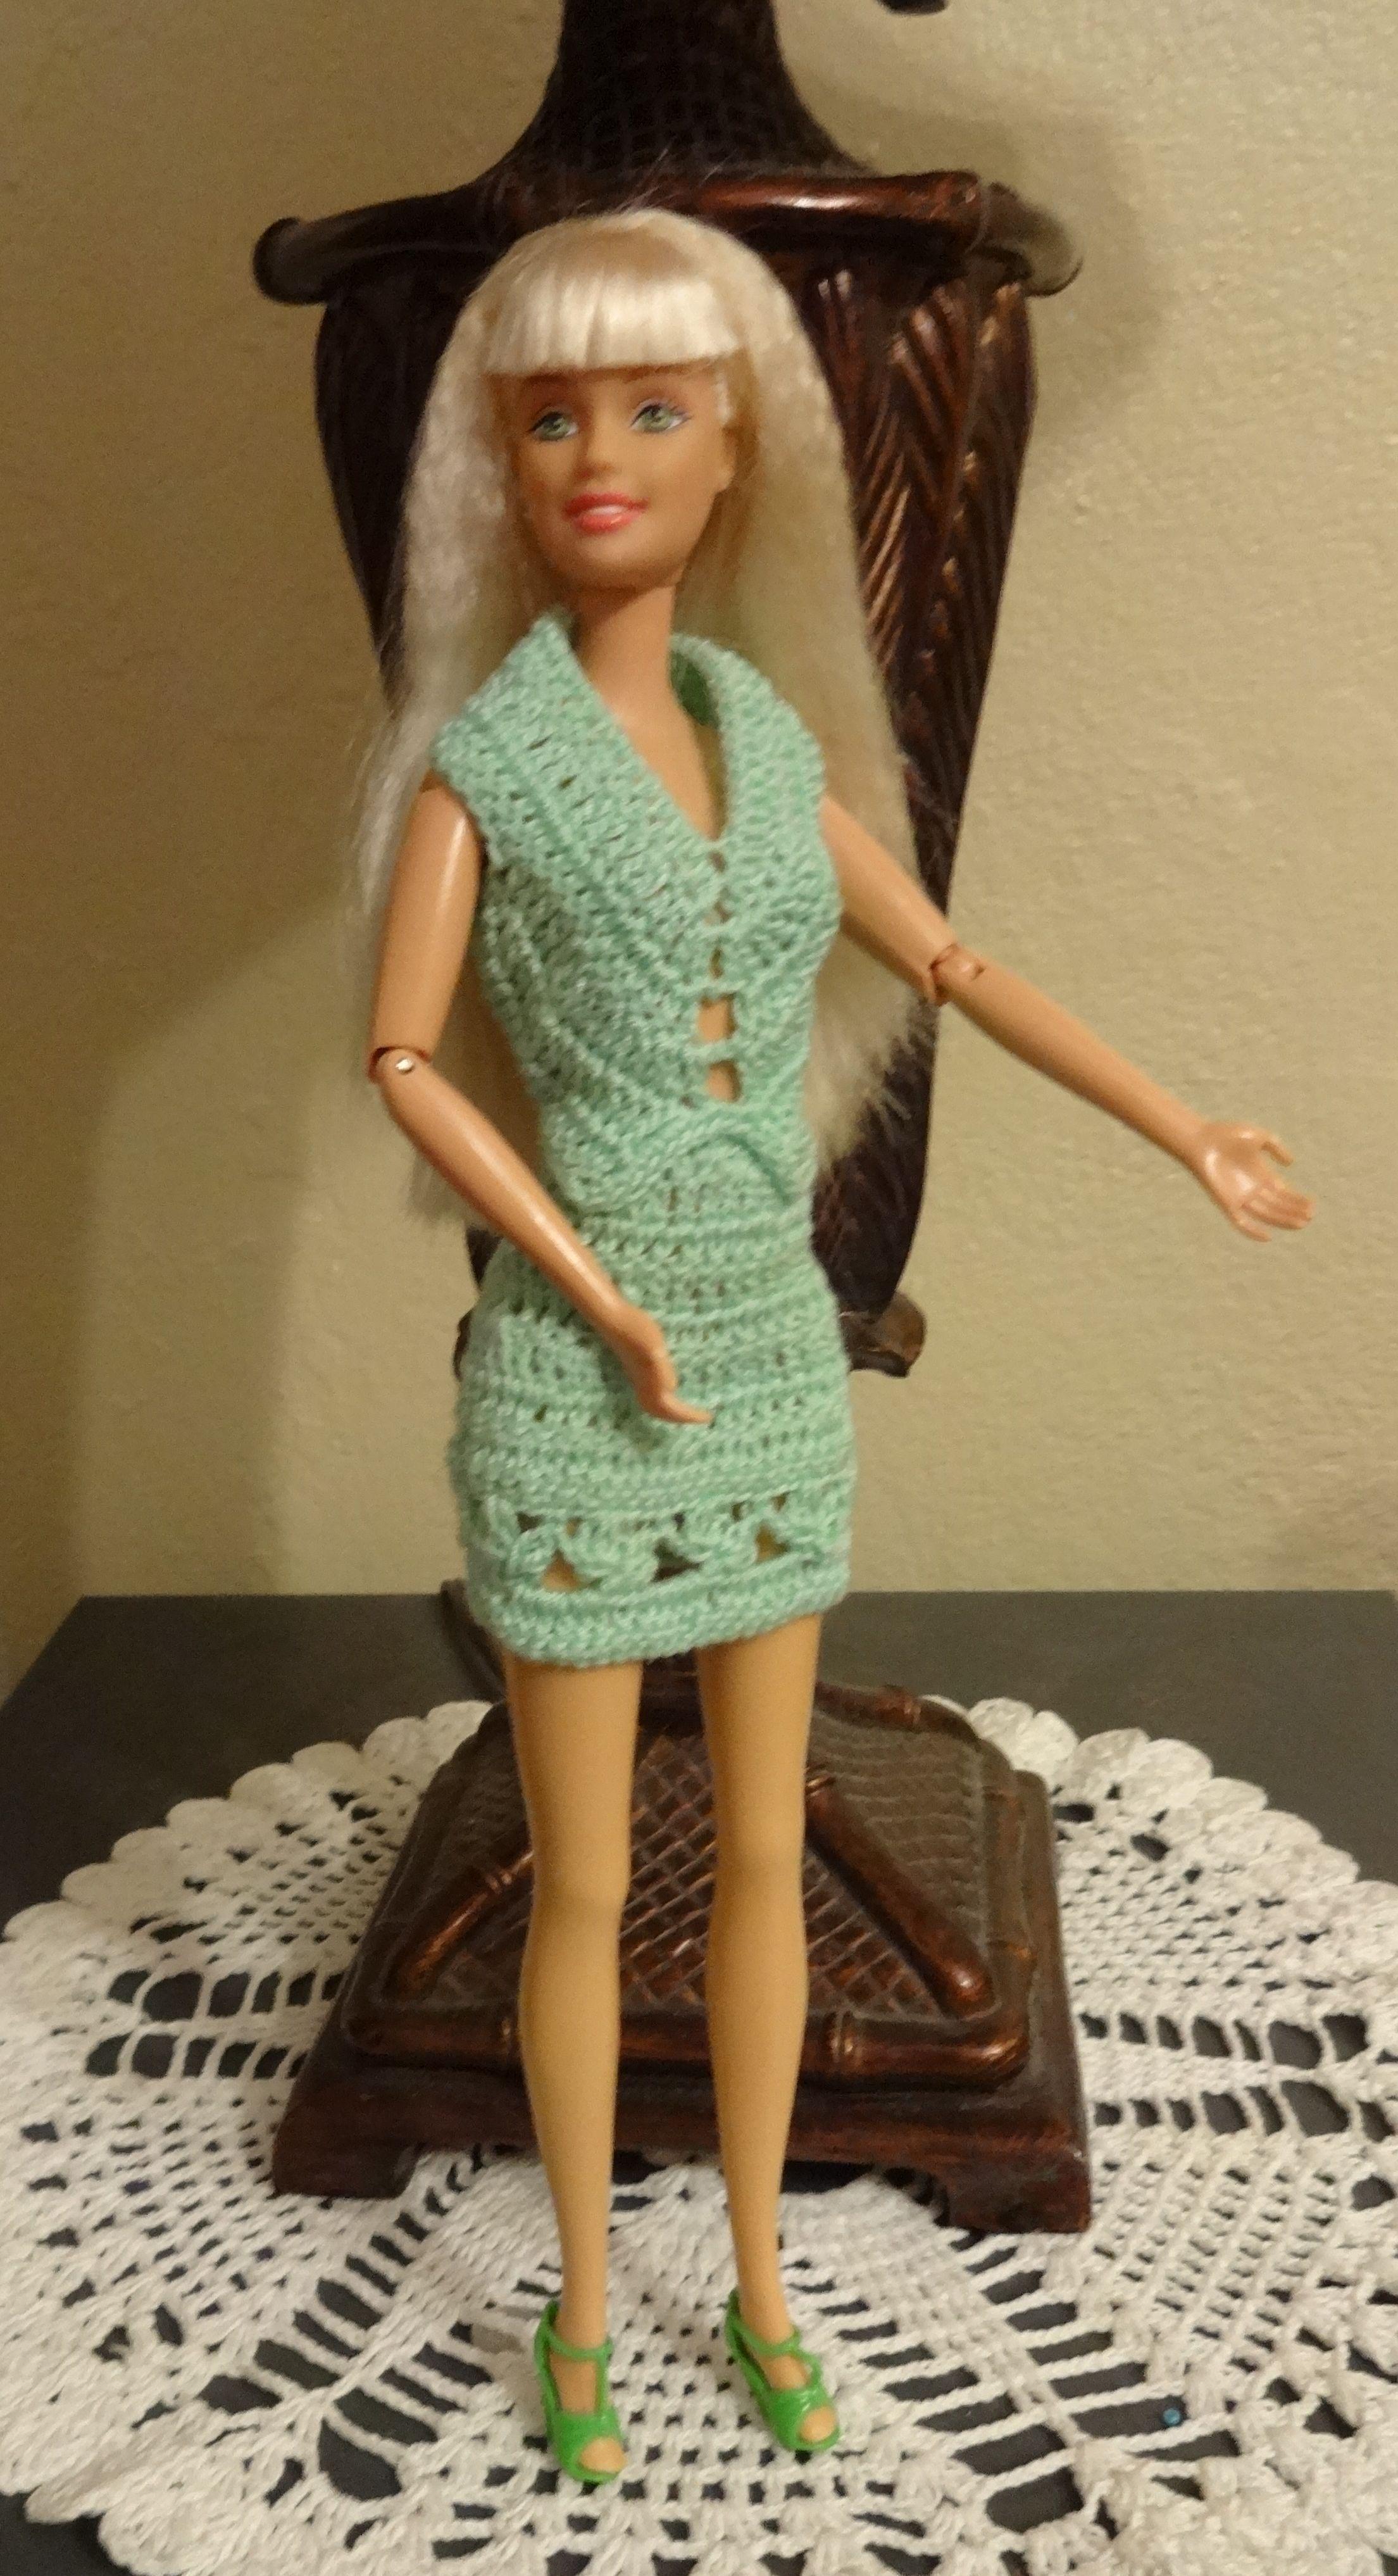 Pin by karen jones on barbie crochet. patterns | Pinterest | Barbie ...